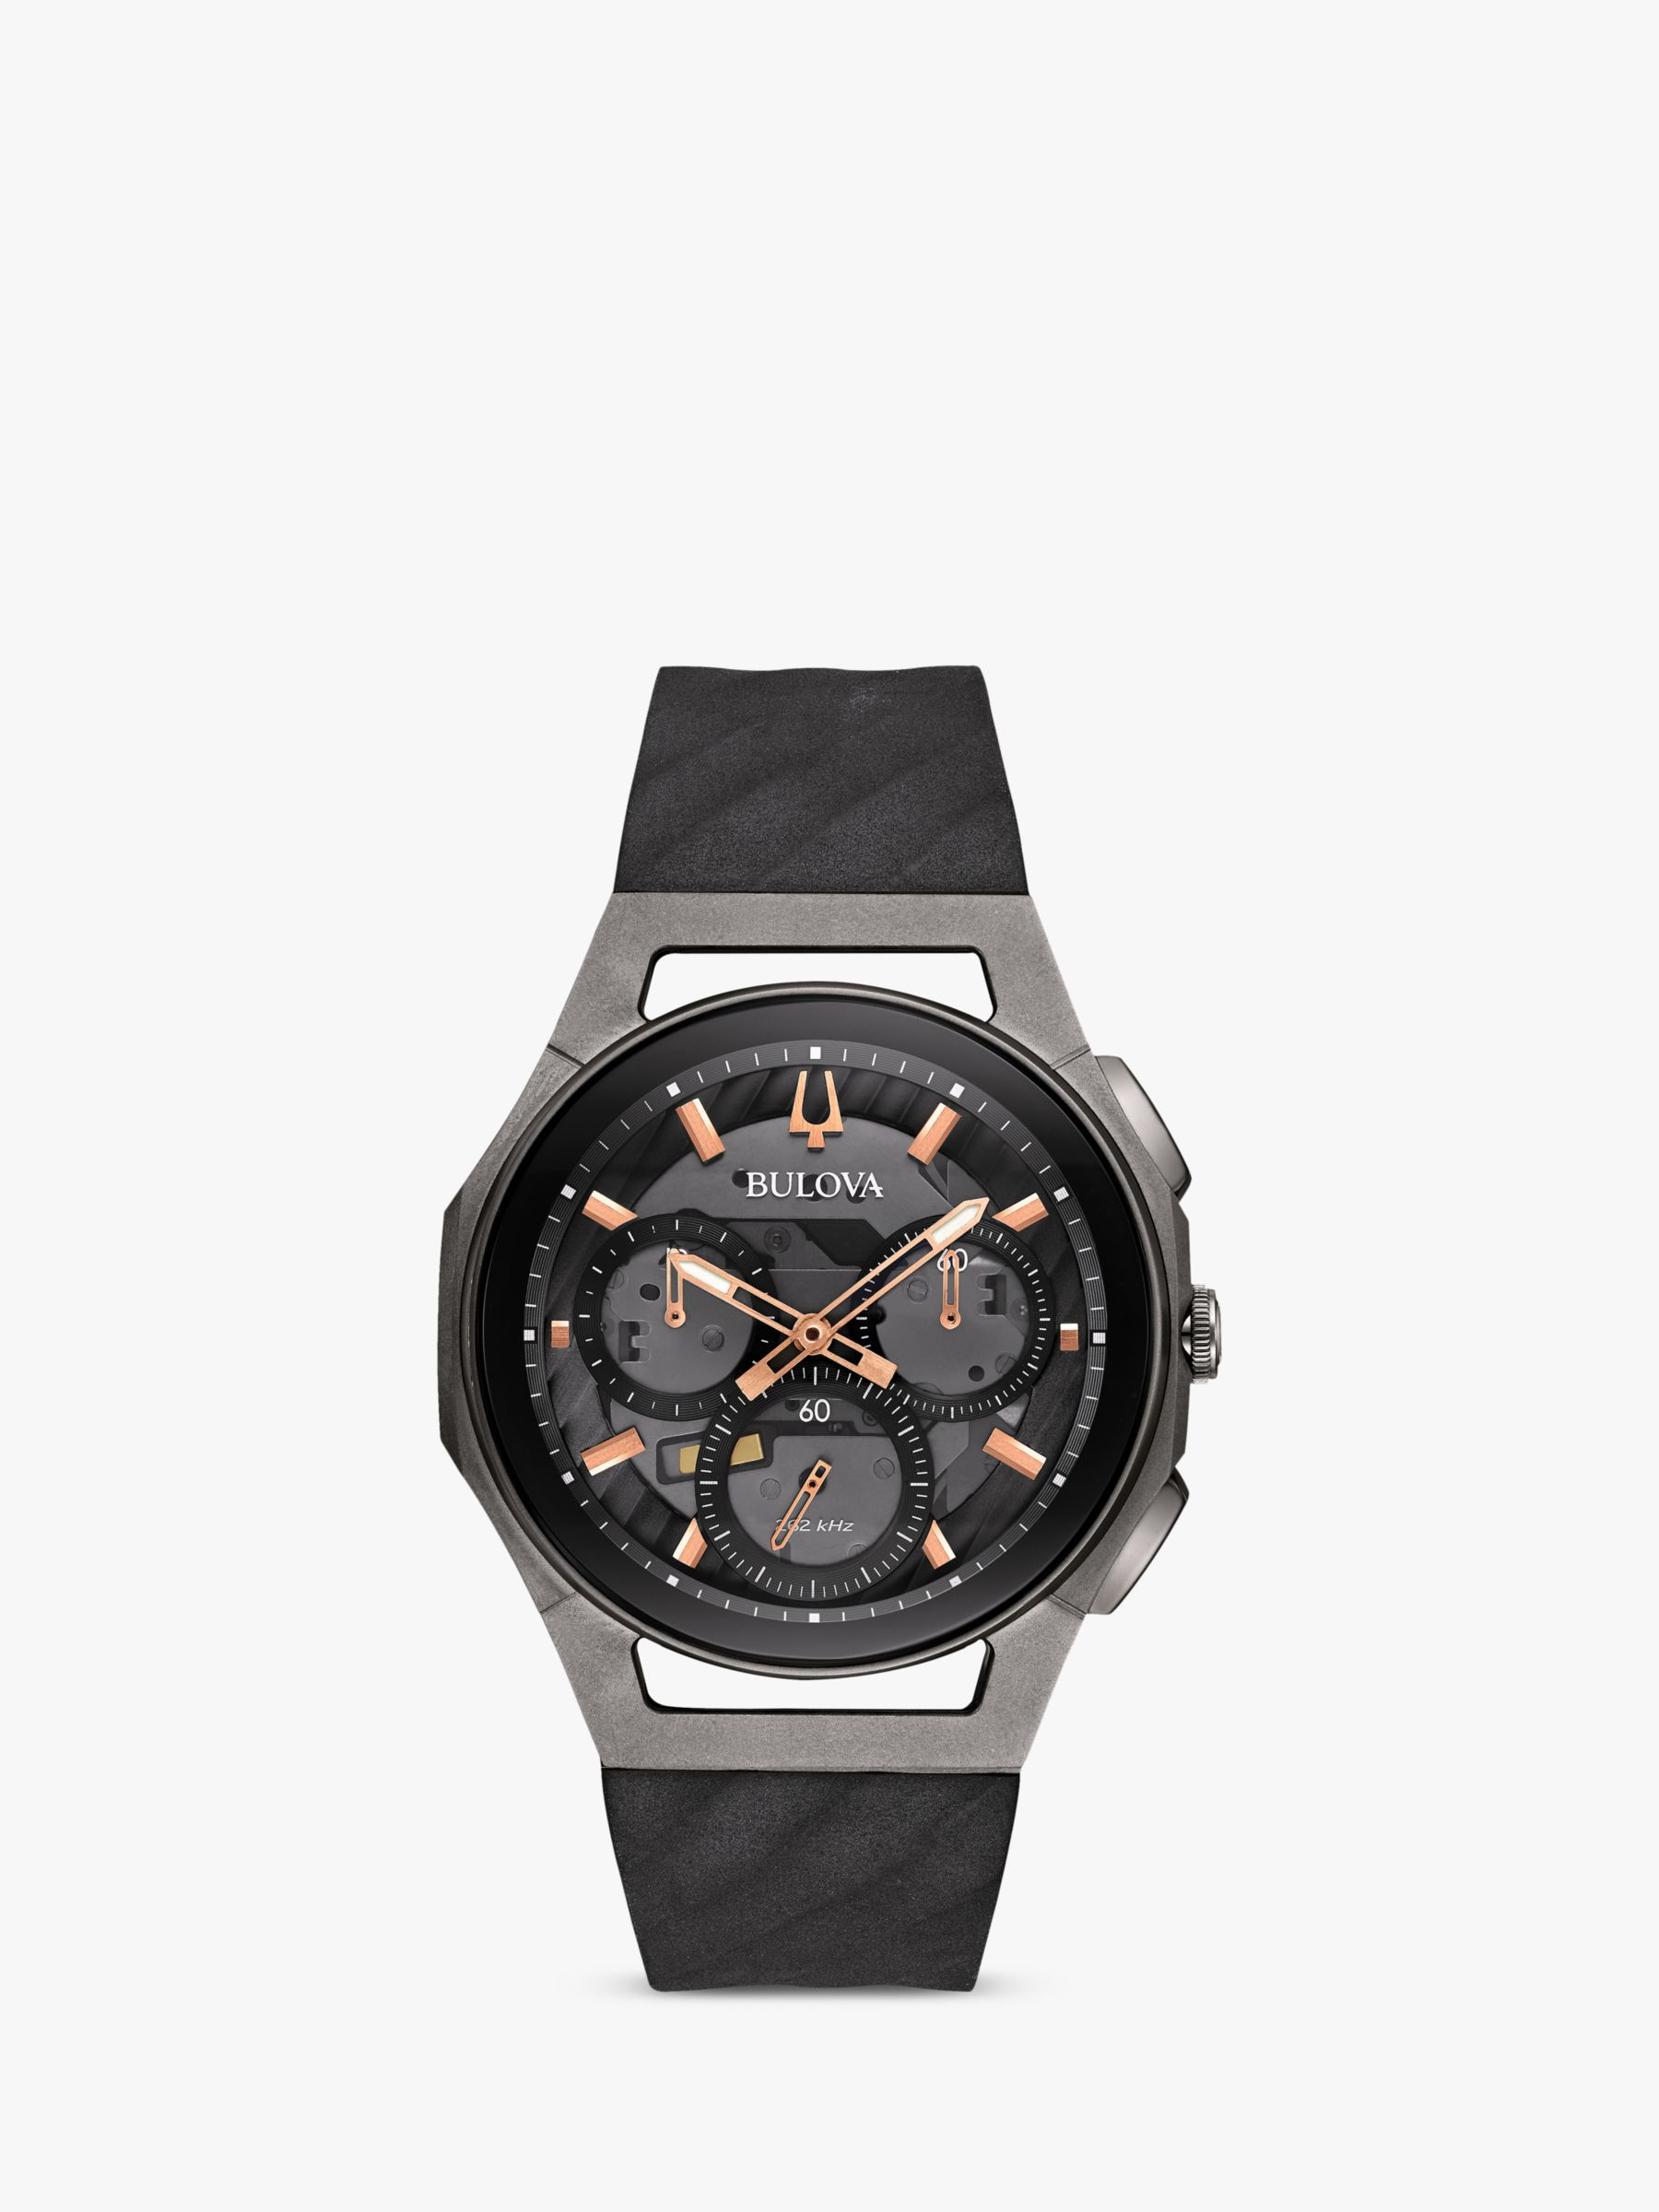 Bulova Bulova Men's Curv Chronograph Rubber Strap Watch